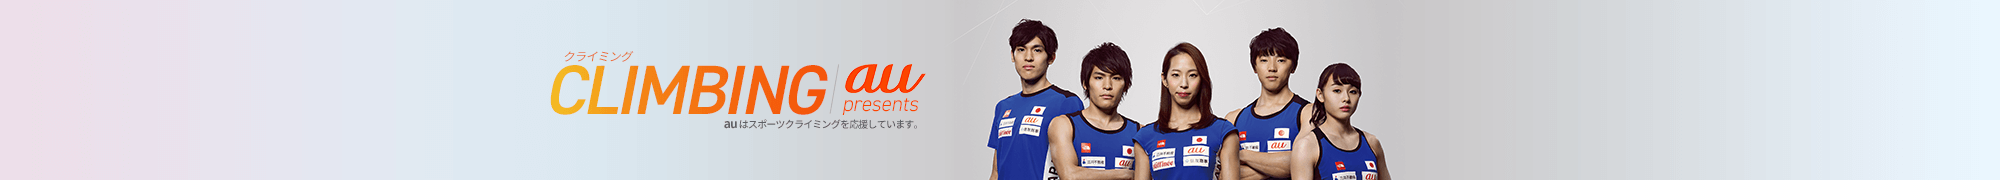 PER-ADRA(ペルアドラ)は、MADE IN JAPANのスポーツクライミング専用シューズ「K-01 JAPAN-LINE」を12月中旬より発売する。